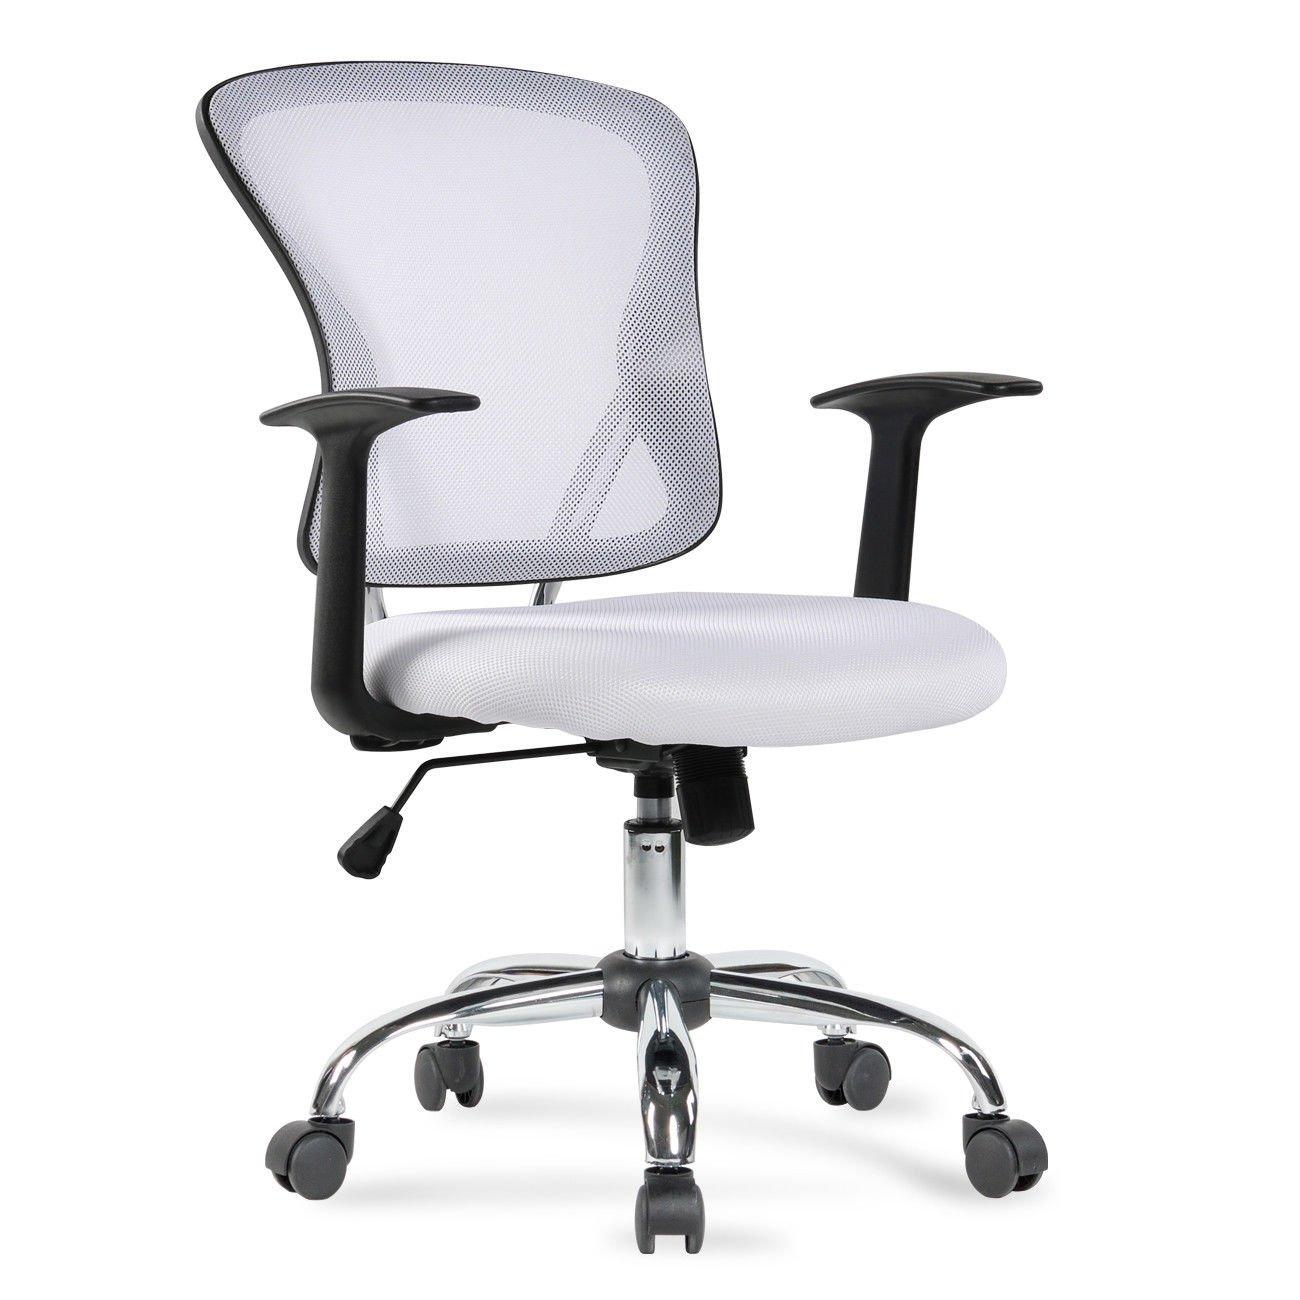 PNPGlobal Ergonomic Office Computer Chair Desk Mid-Back Mesh Task Executive Swivel, White